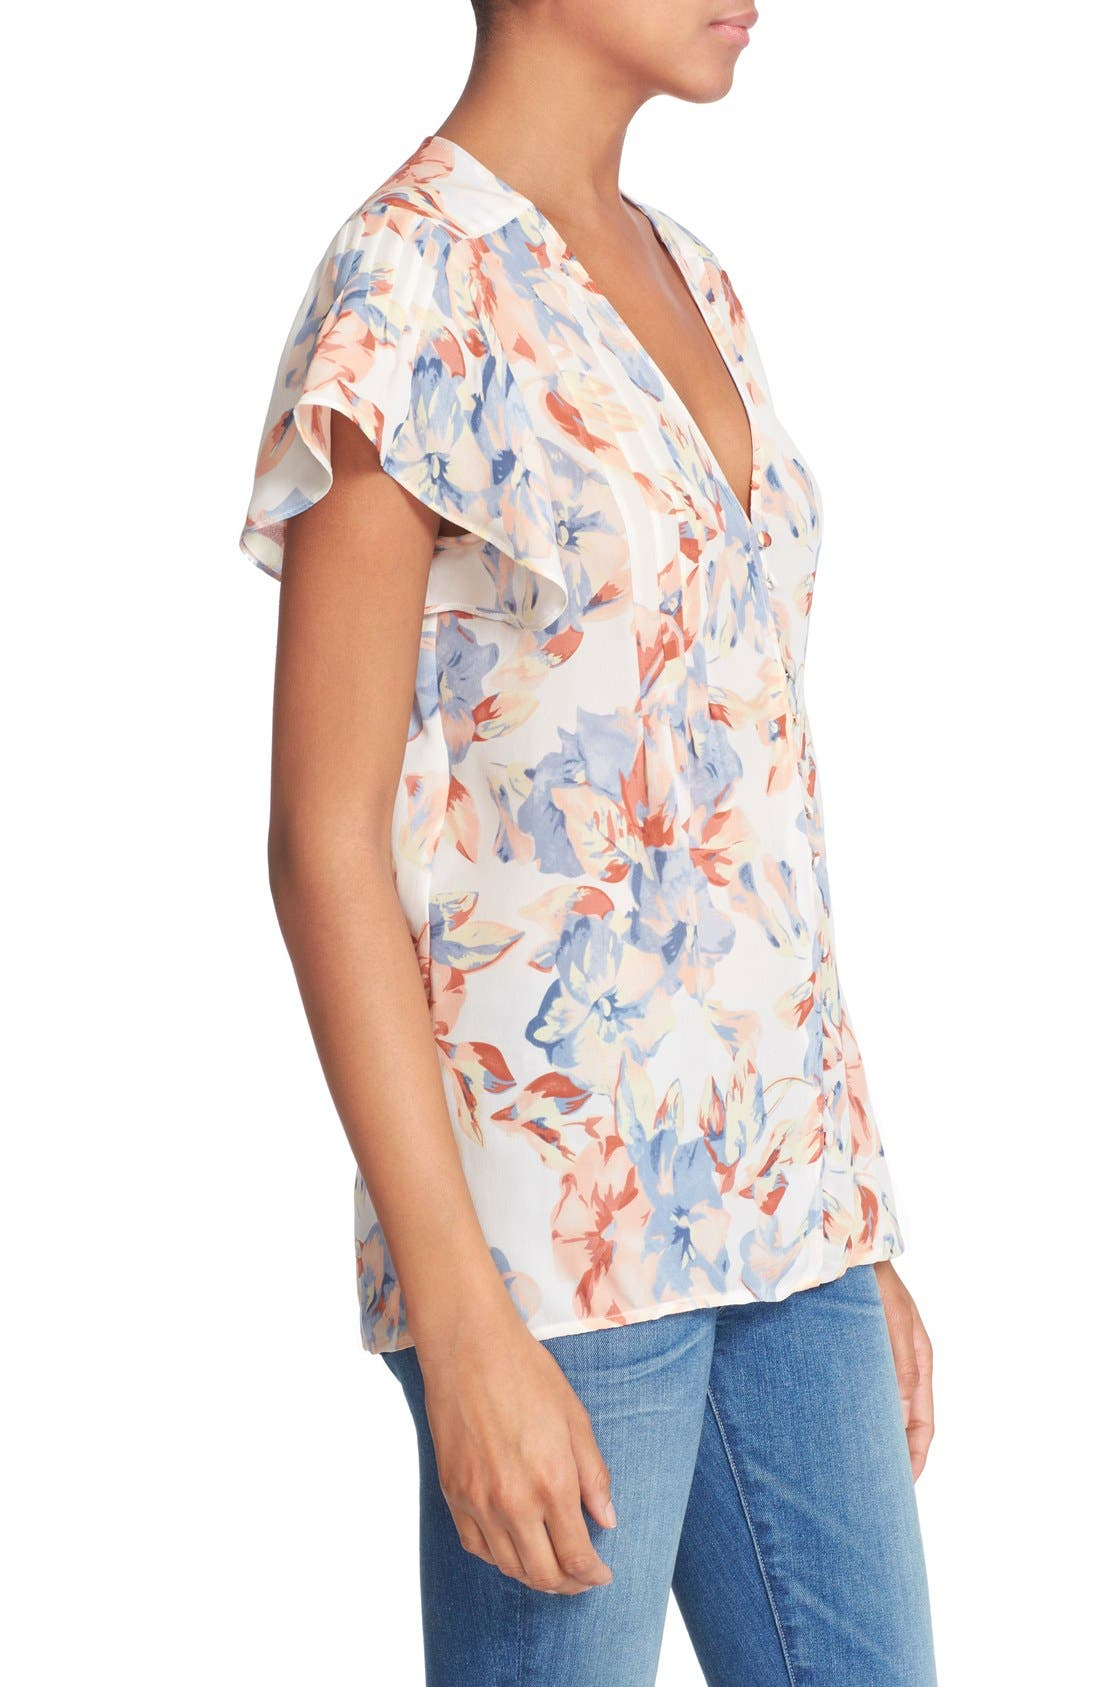 JOIE,                             'Annite' Floral Print Silk Top,                             Alternate thumbnail 3, color,                             901